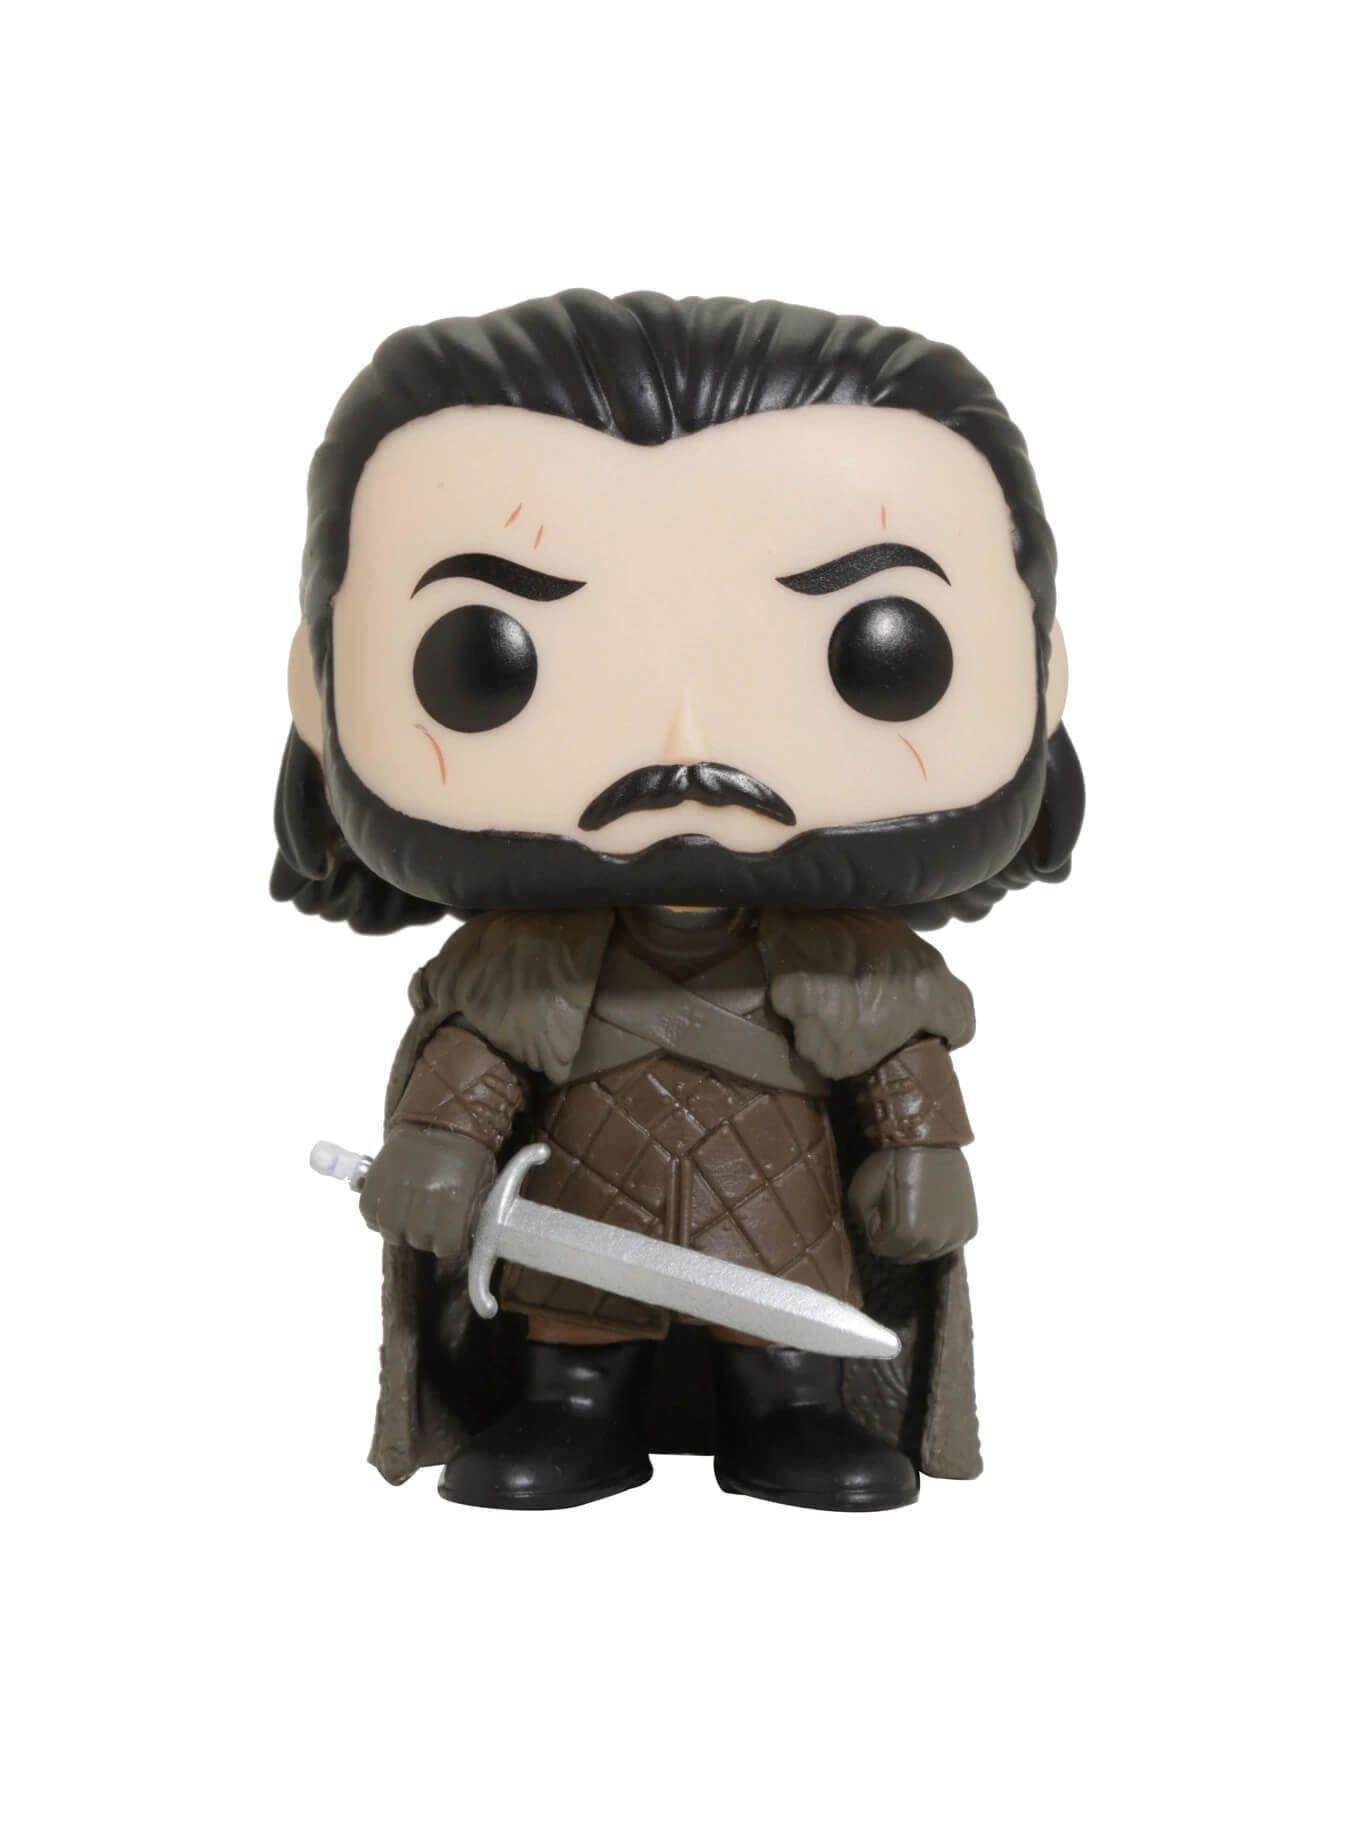 Jon Snow #49 - Game of Thrones - Funko Pop!